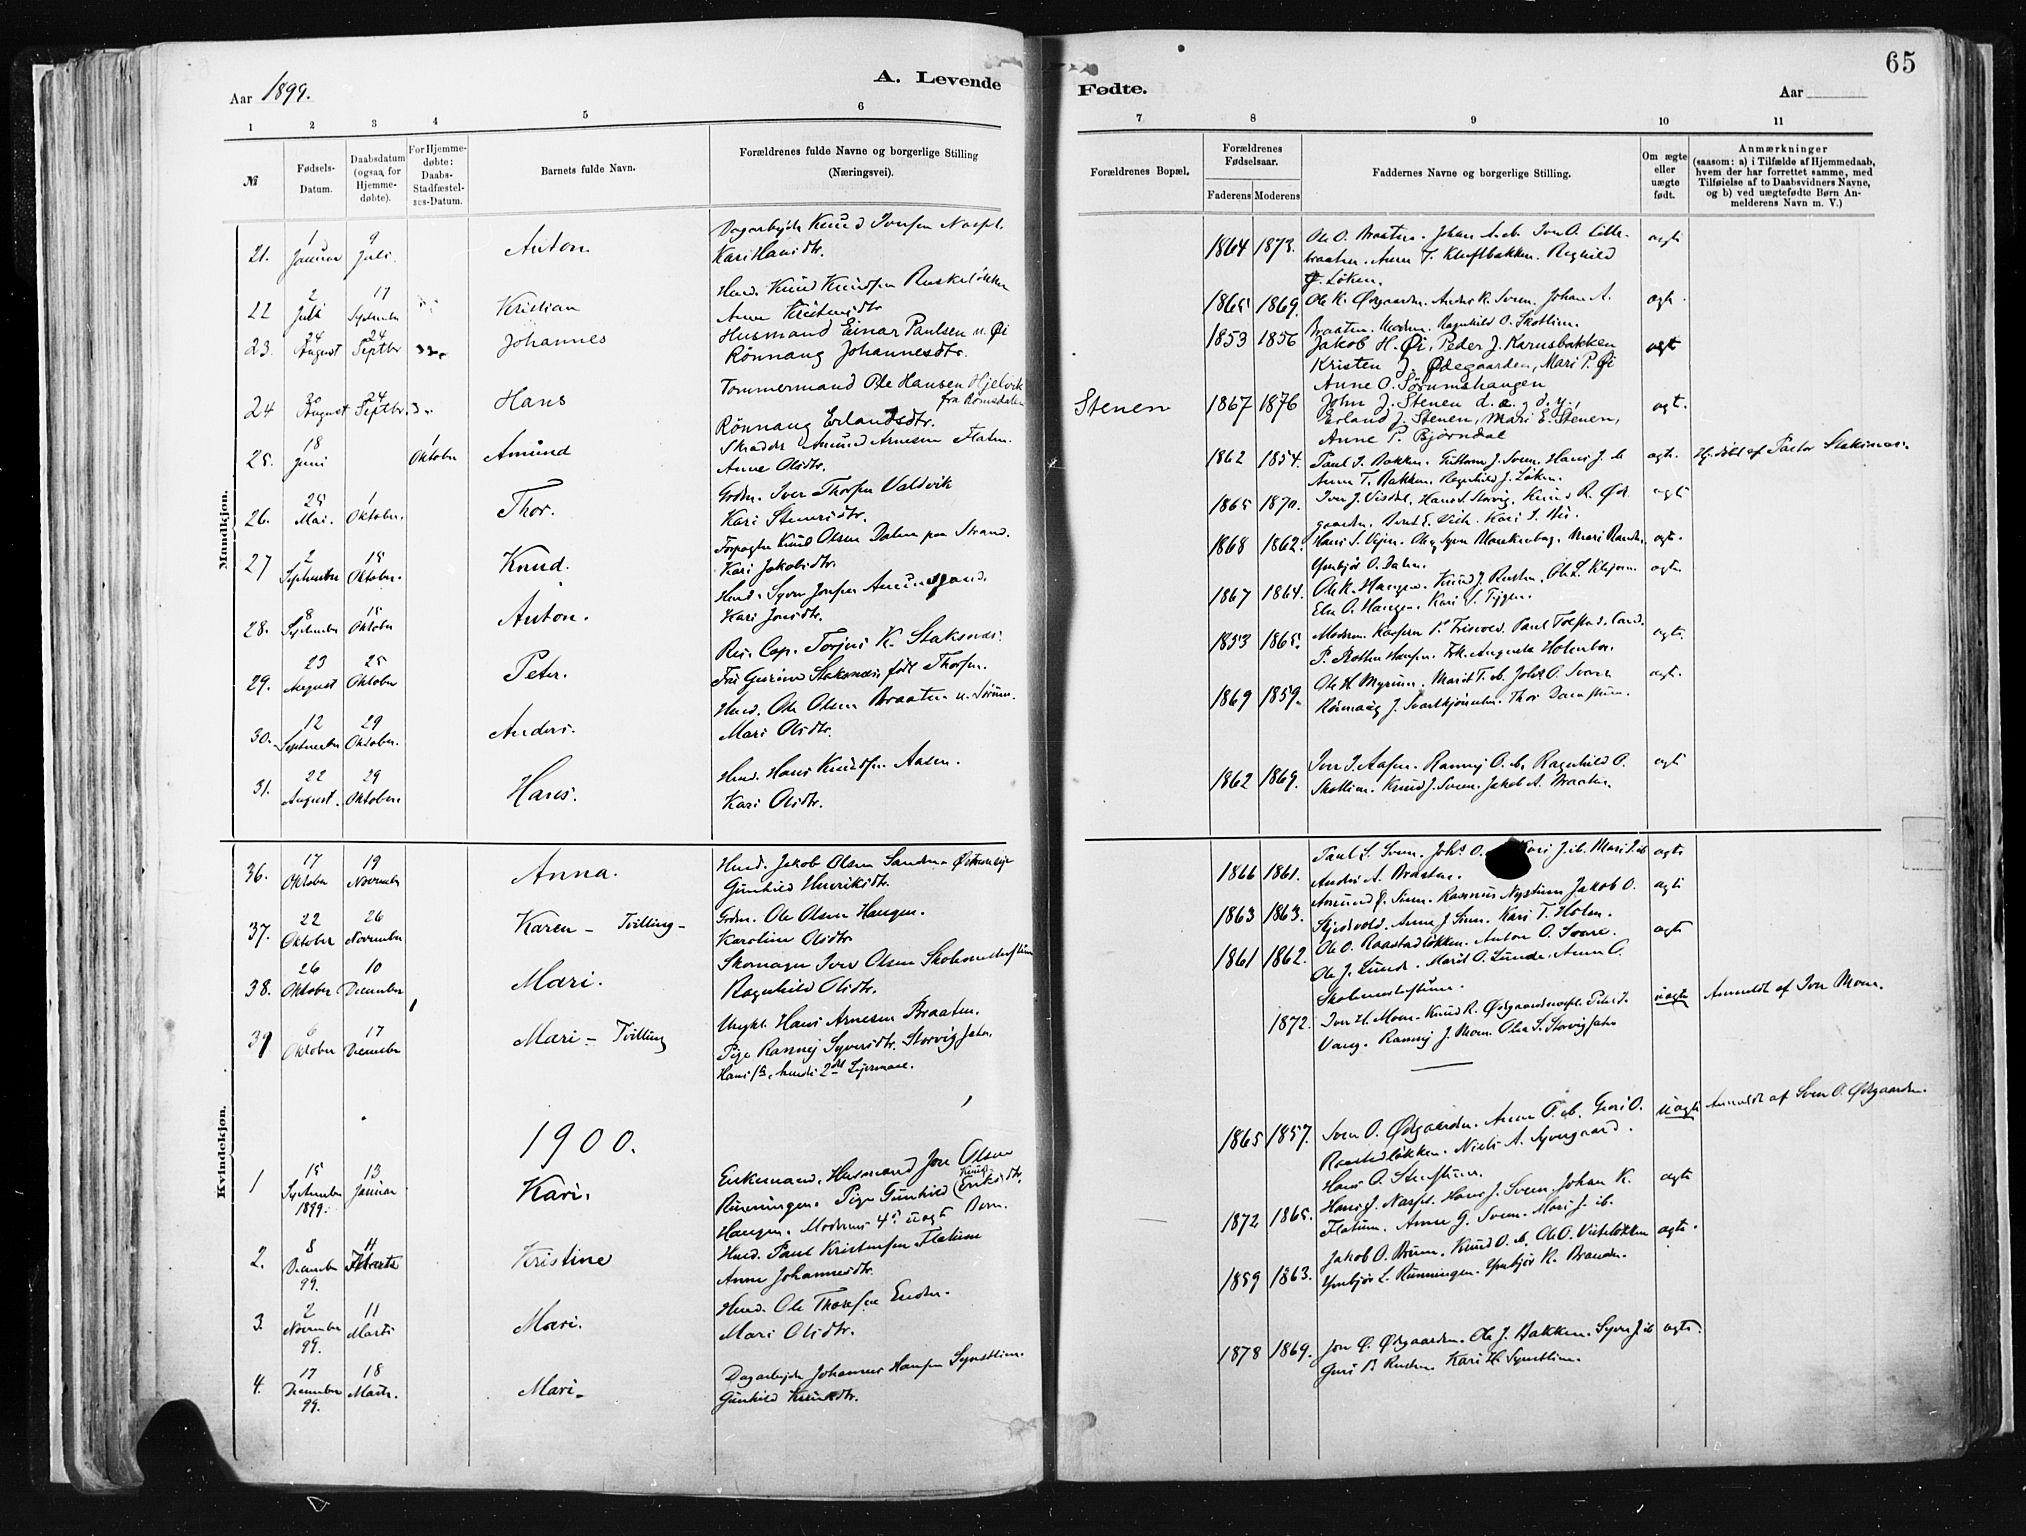 SAH, Vågå prestekontor, Ministerialbok nr. 9, 1886-1904, s. 65